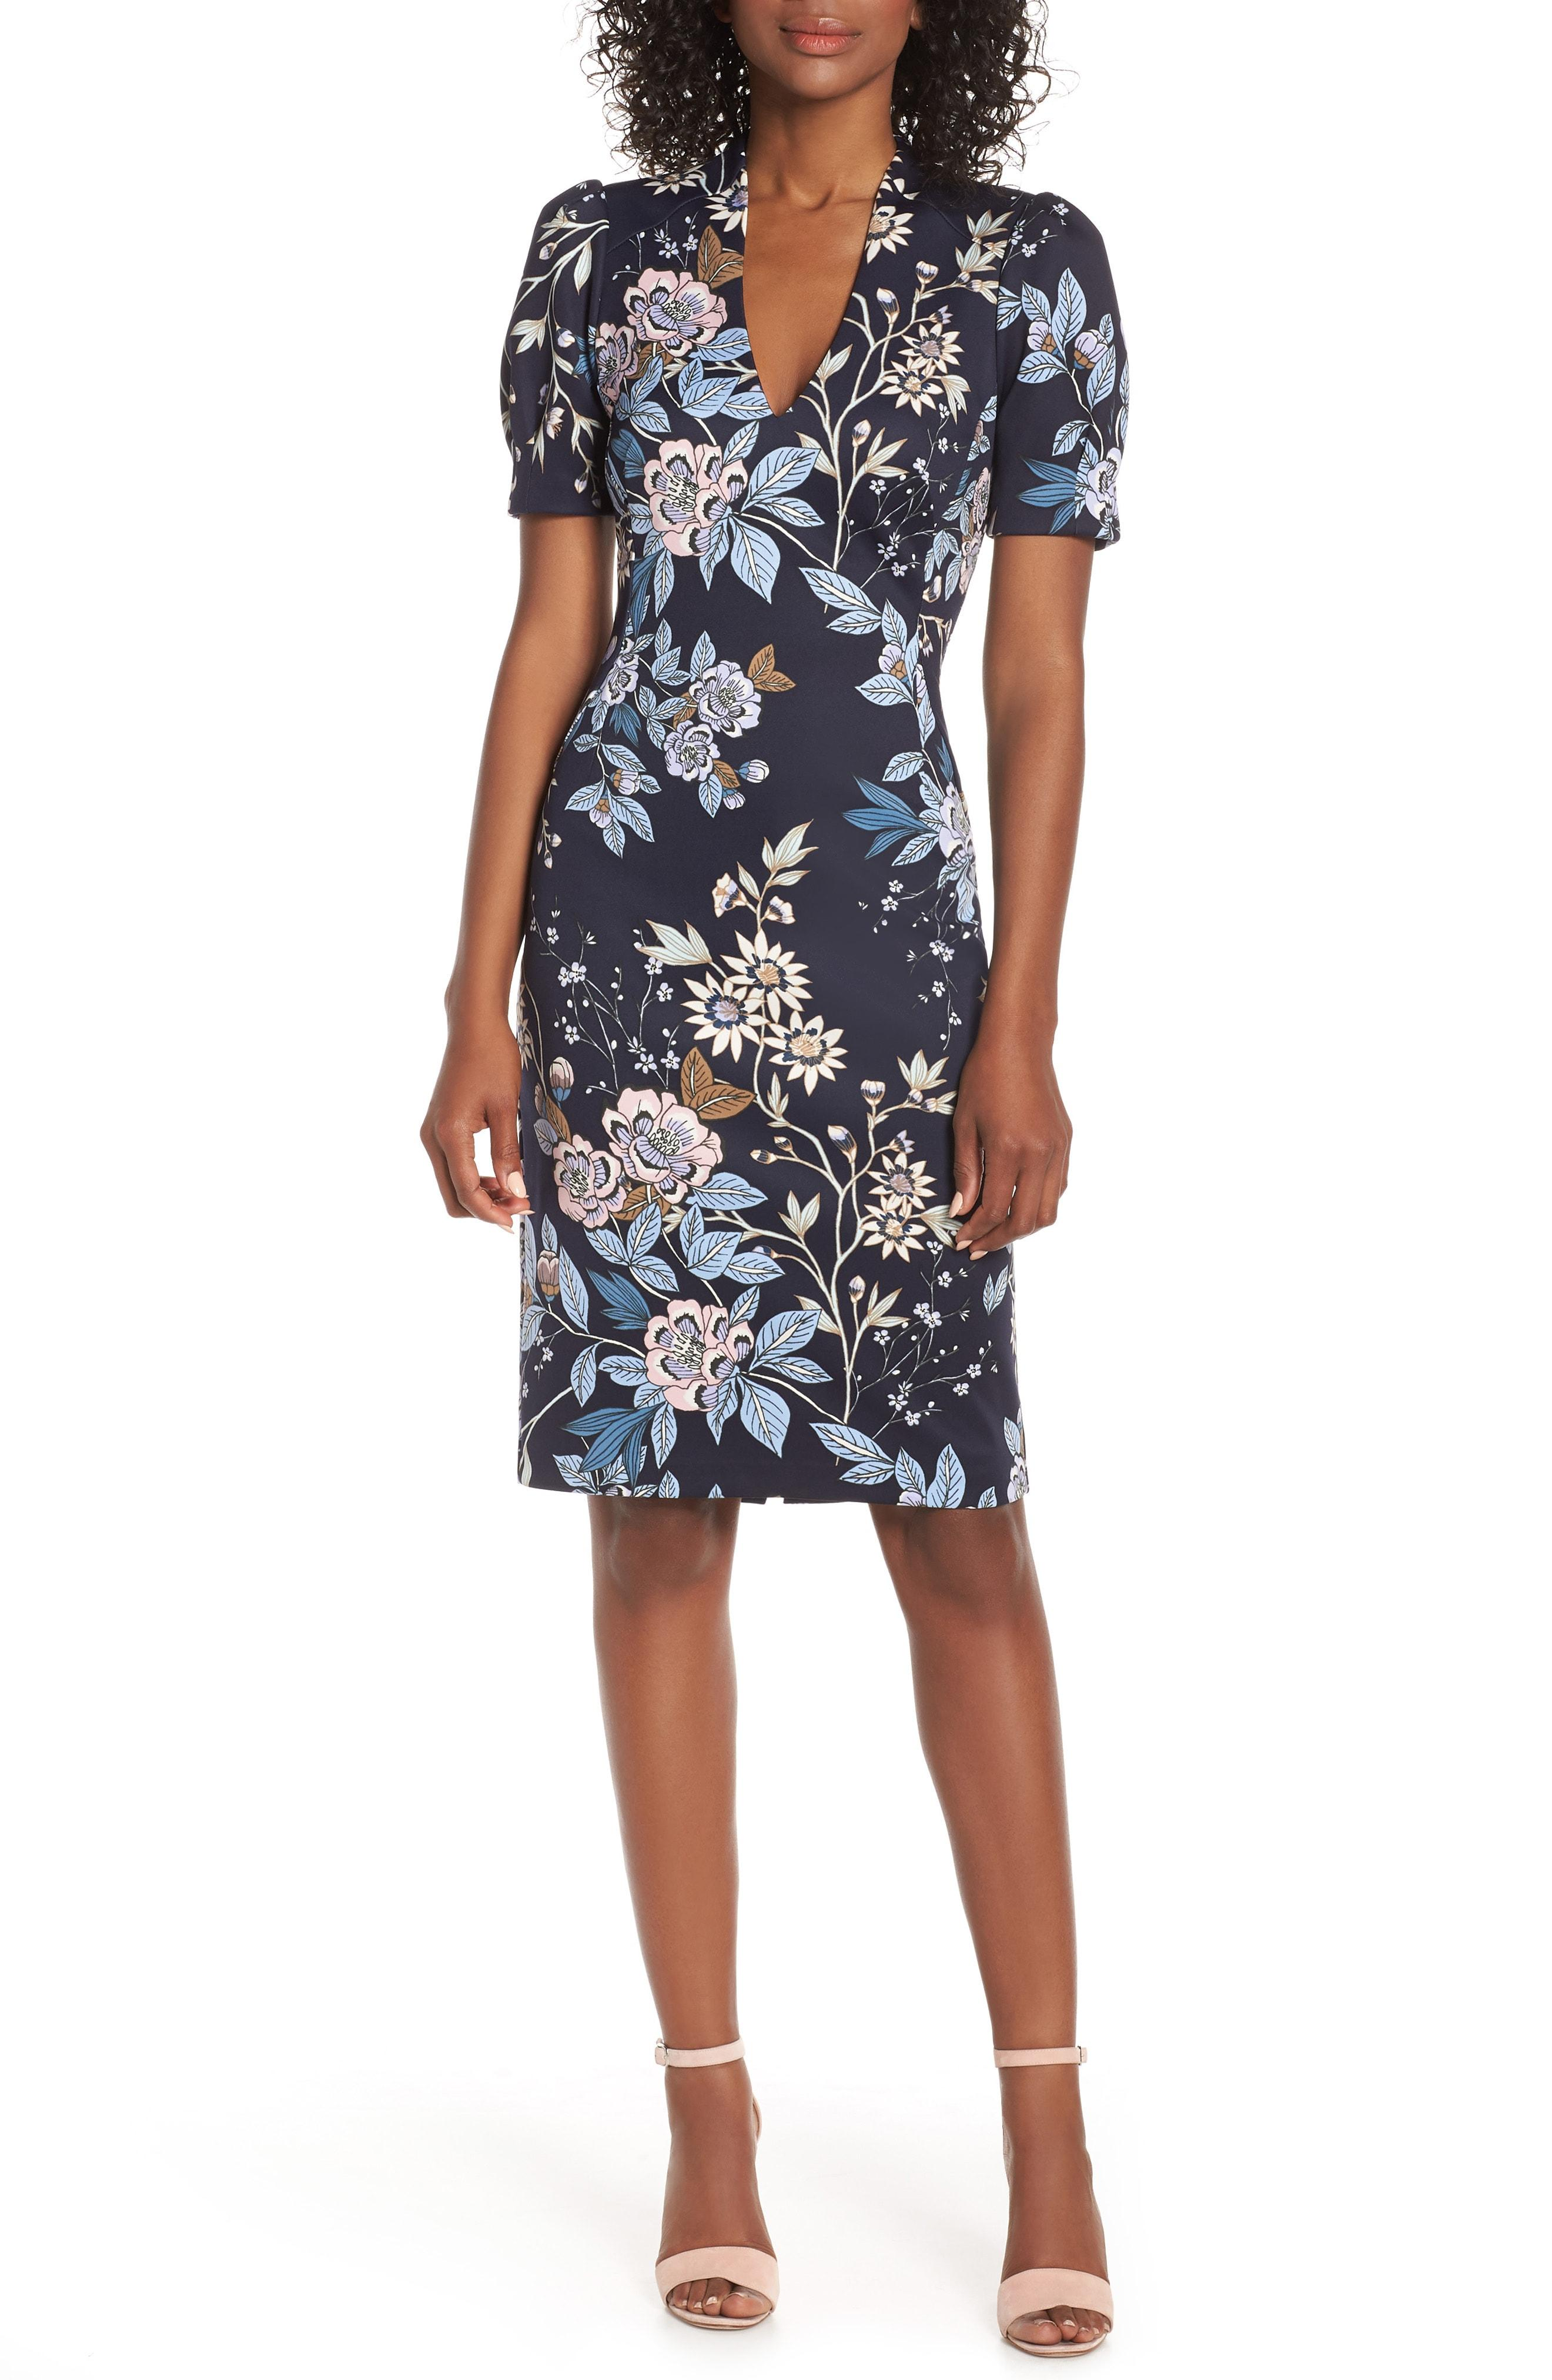 c583f92b Lyst - Vince Camuto Floral Print Scuba Crepe Sheath Dress in Blue